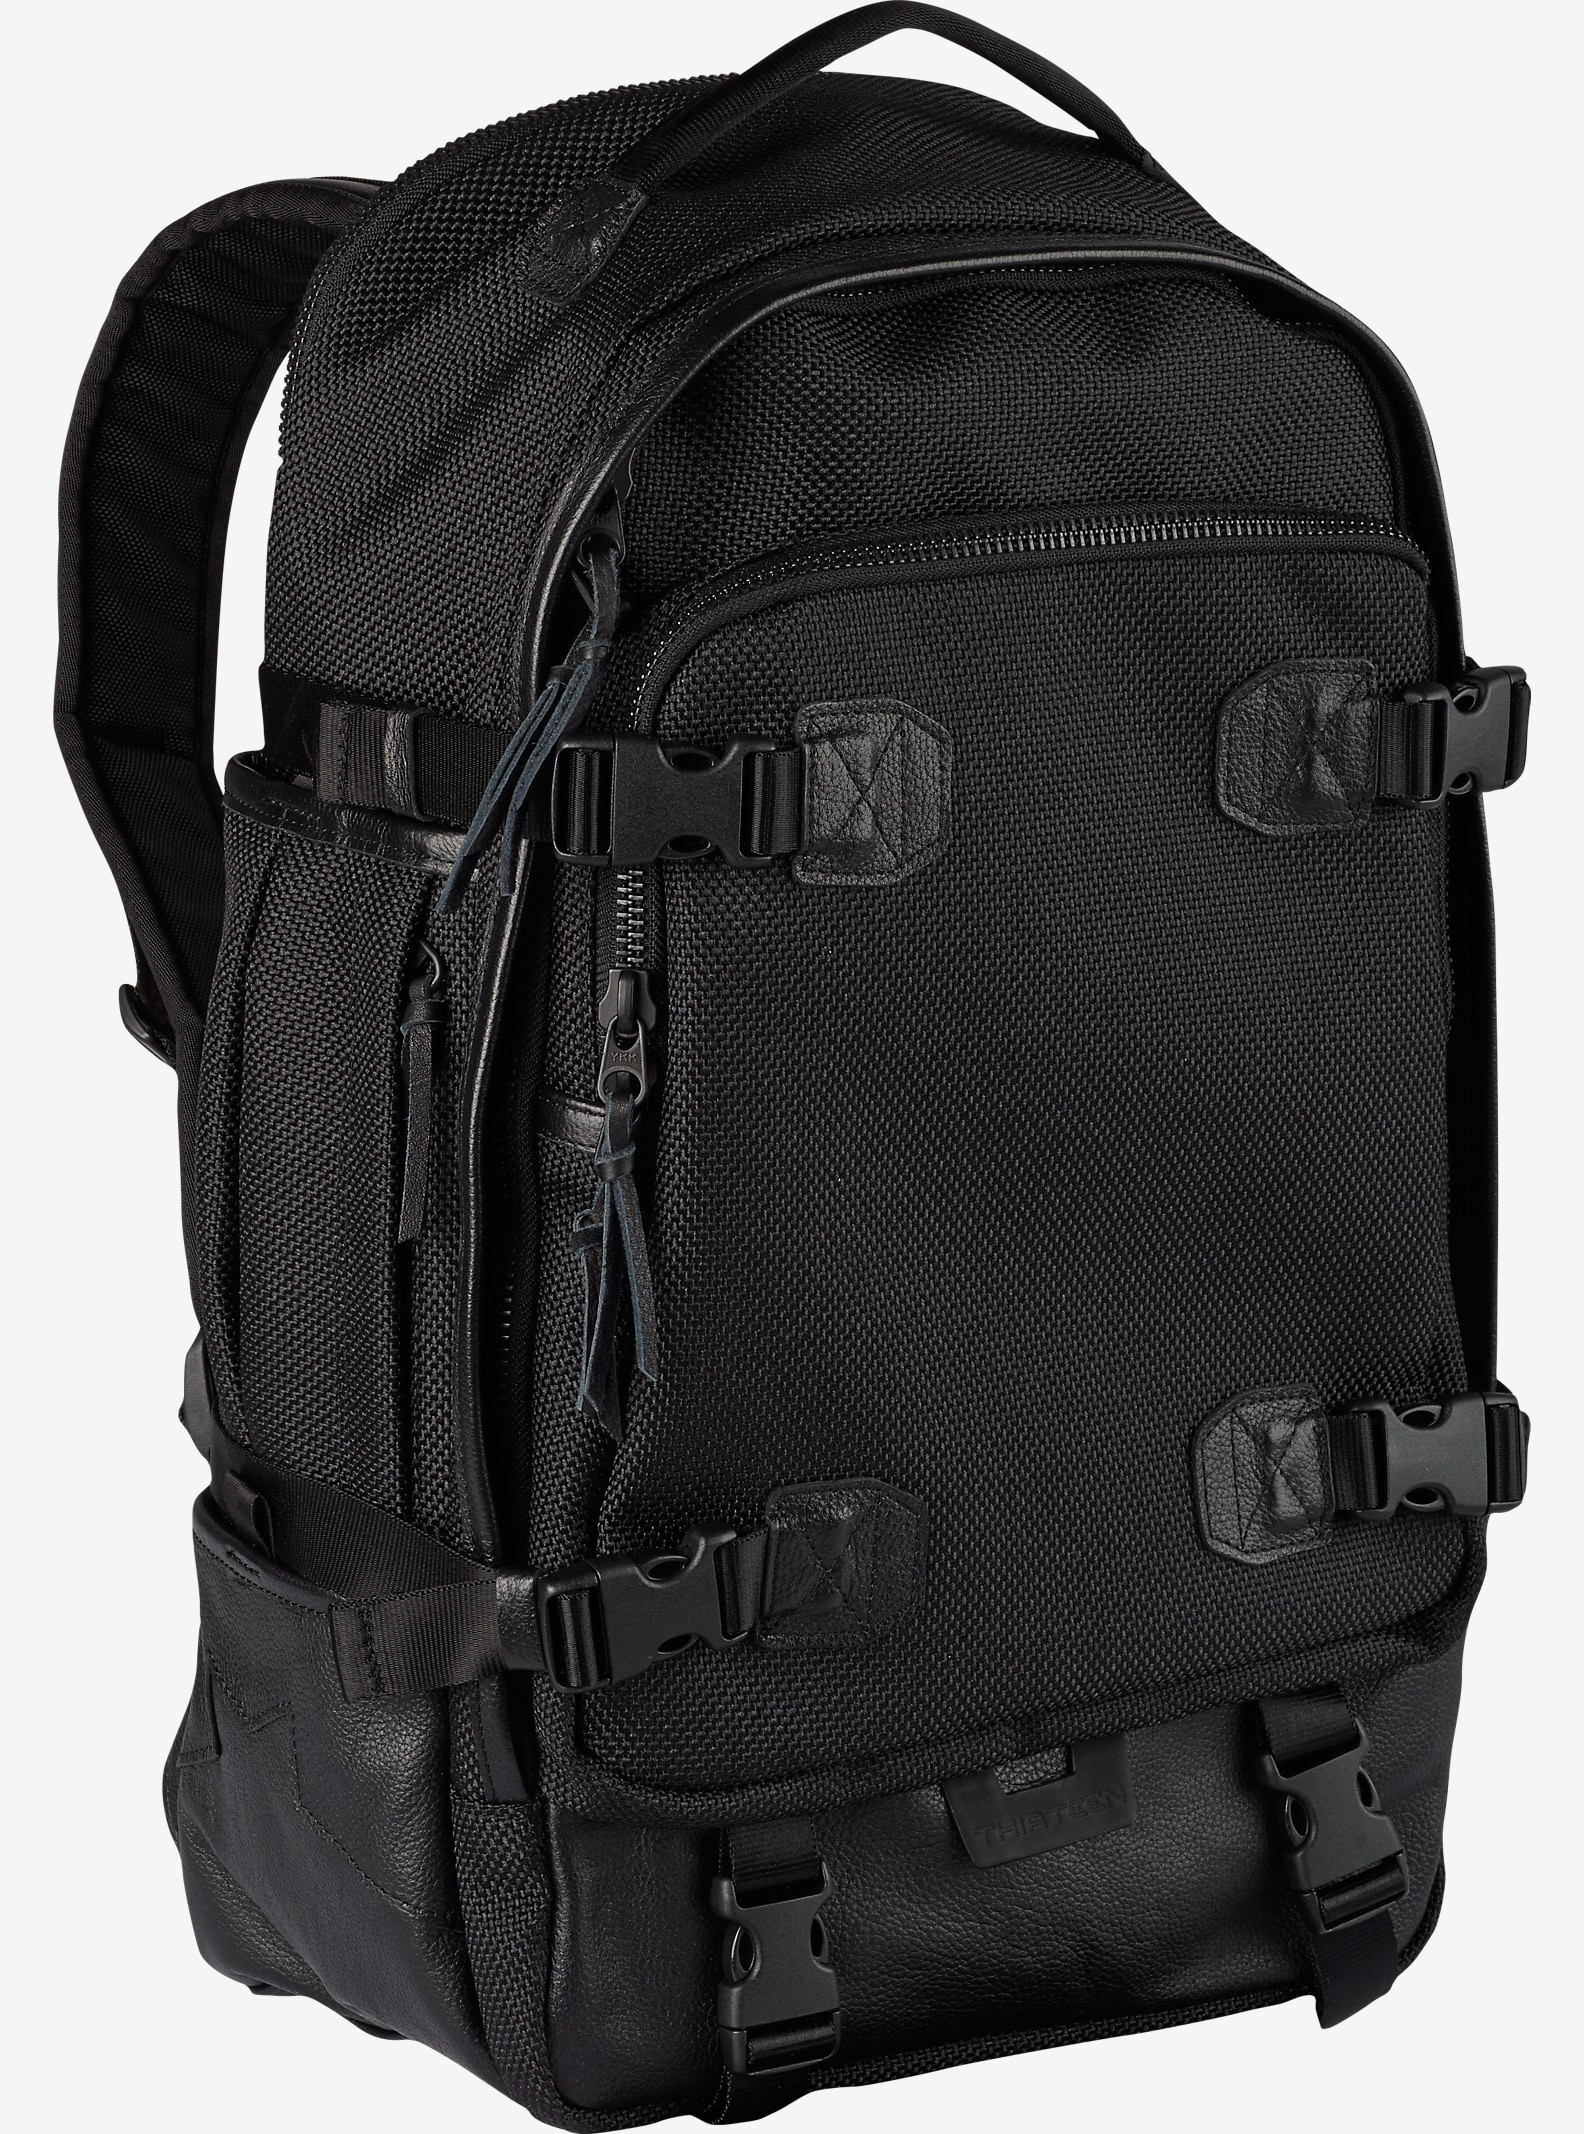 Burton THIRTEEN Snipe Backpack shown in Black